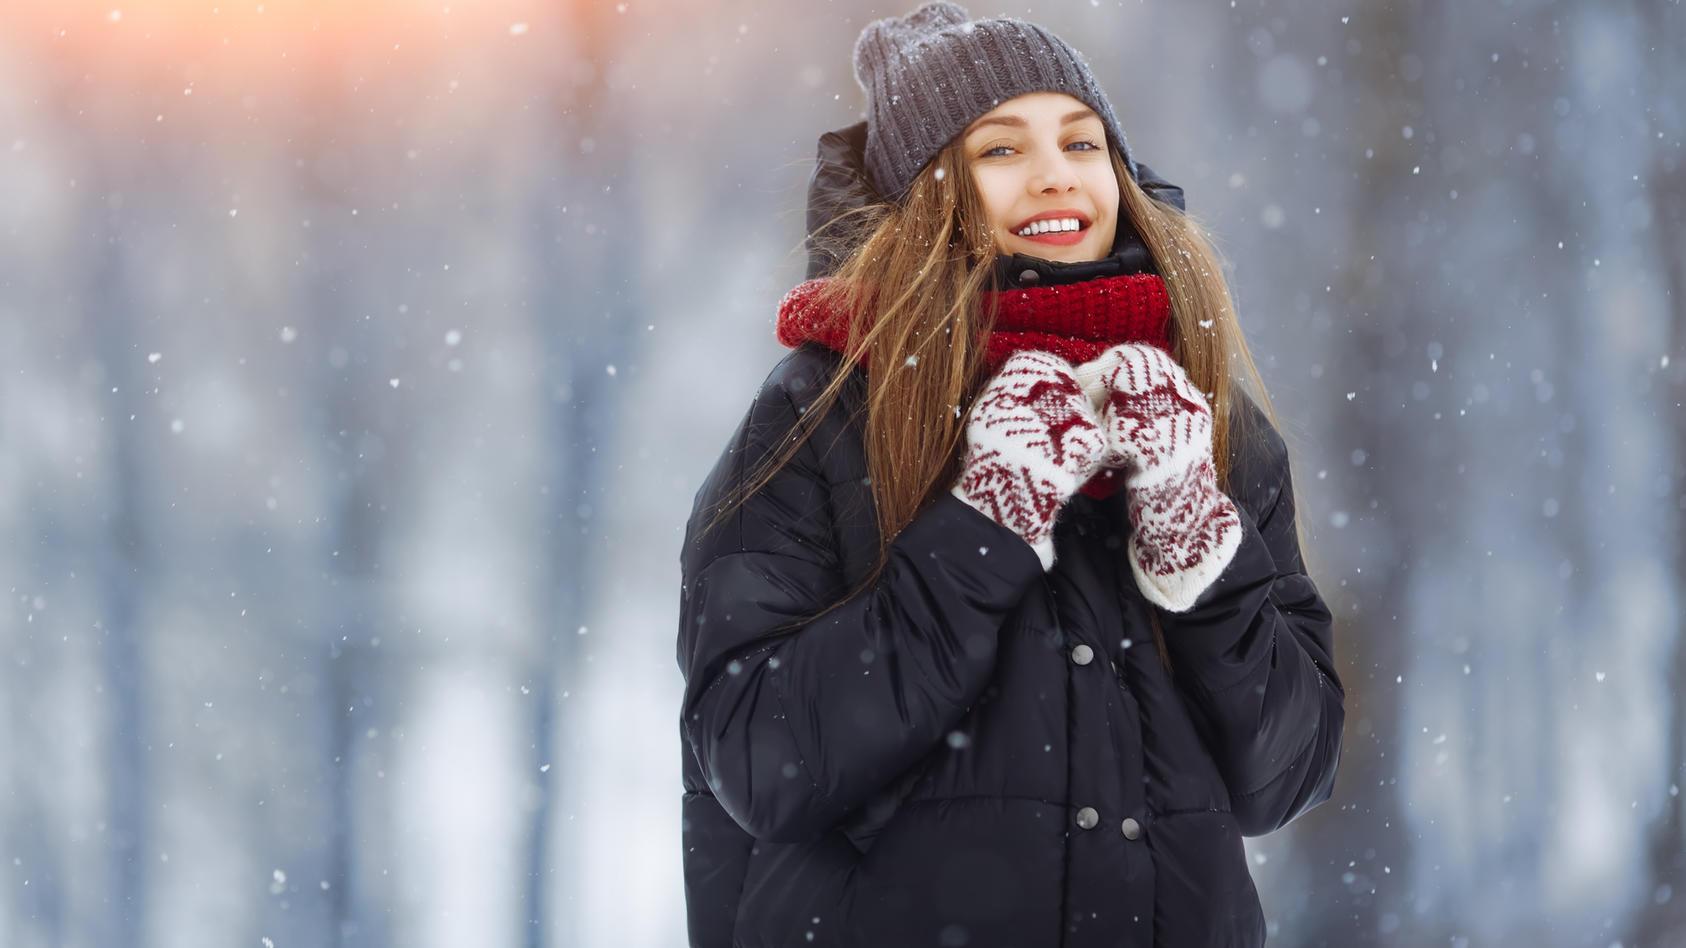 Junge Frau im Wintermantel.